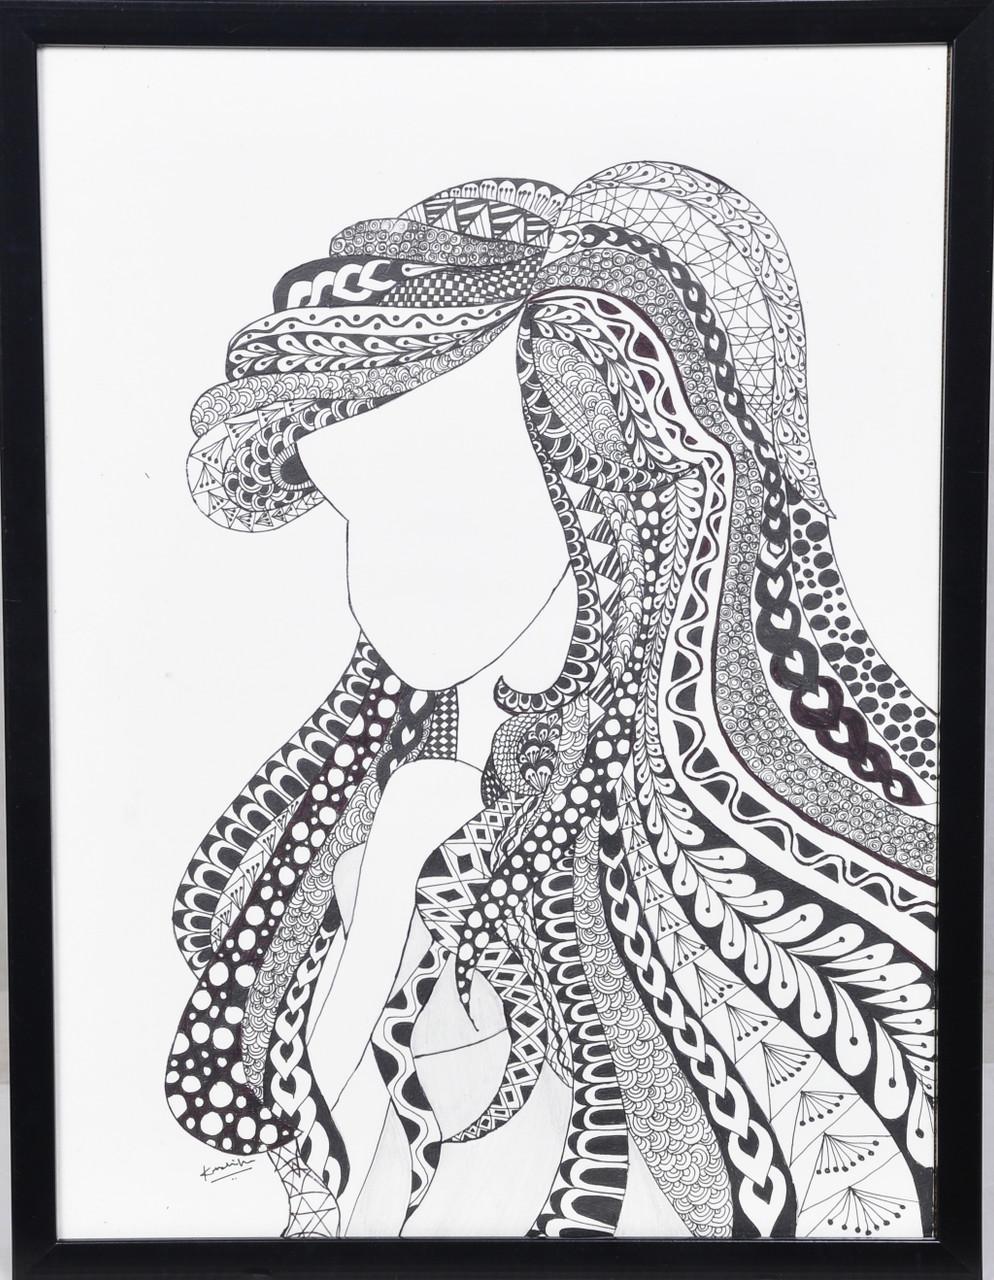 Zentangle angel handmade artwork art 6833 39637 handpainted art painting 12in x 16in